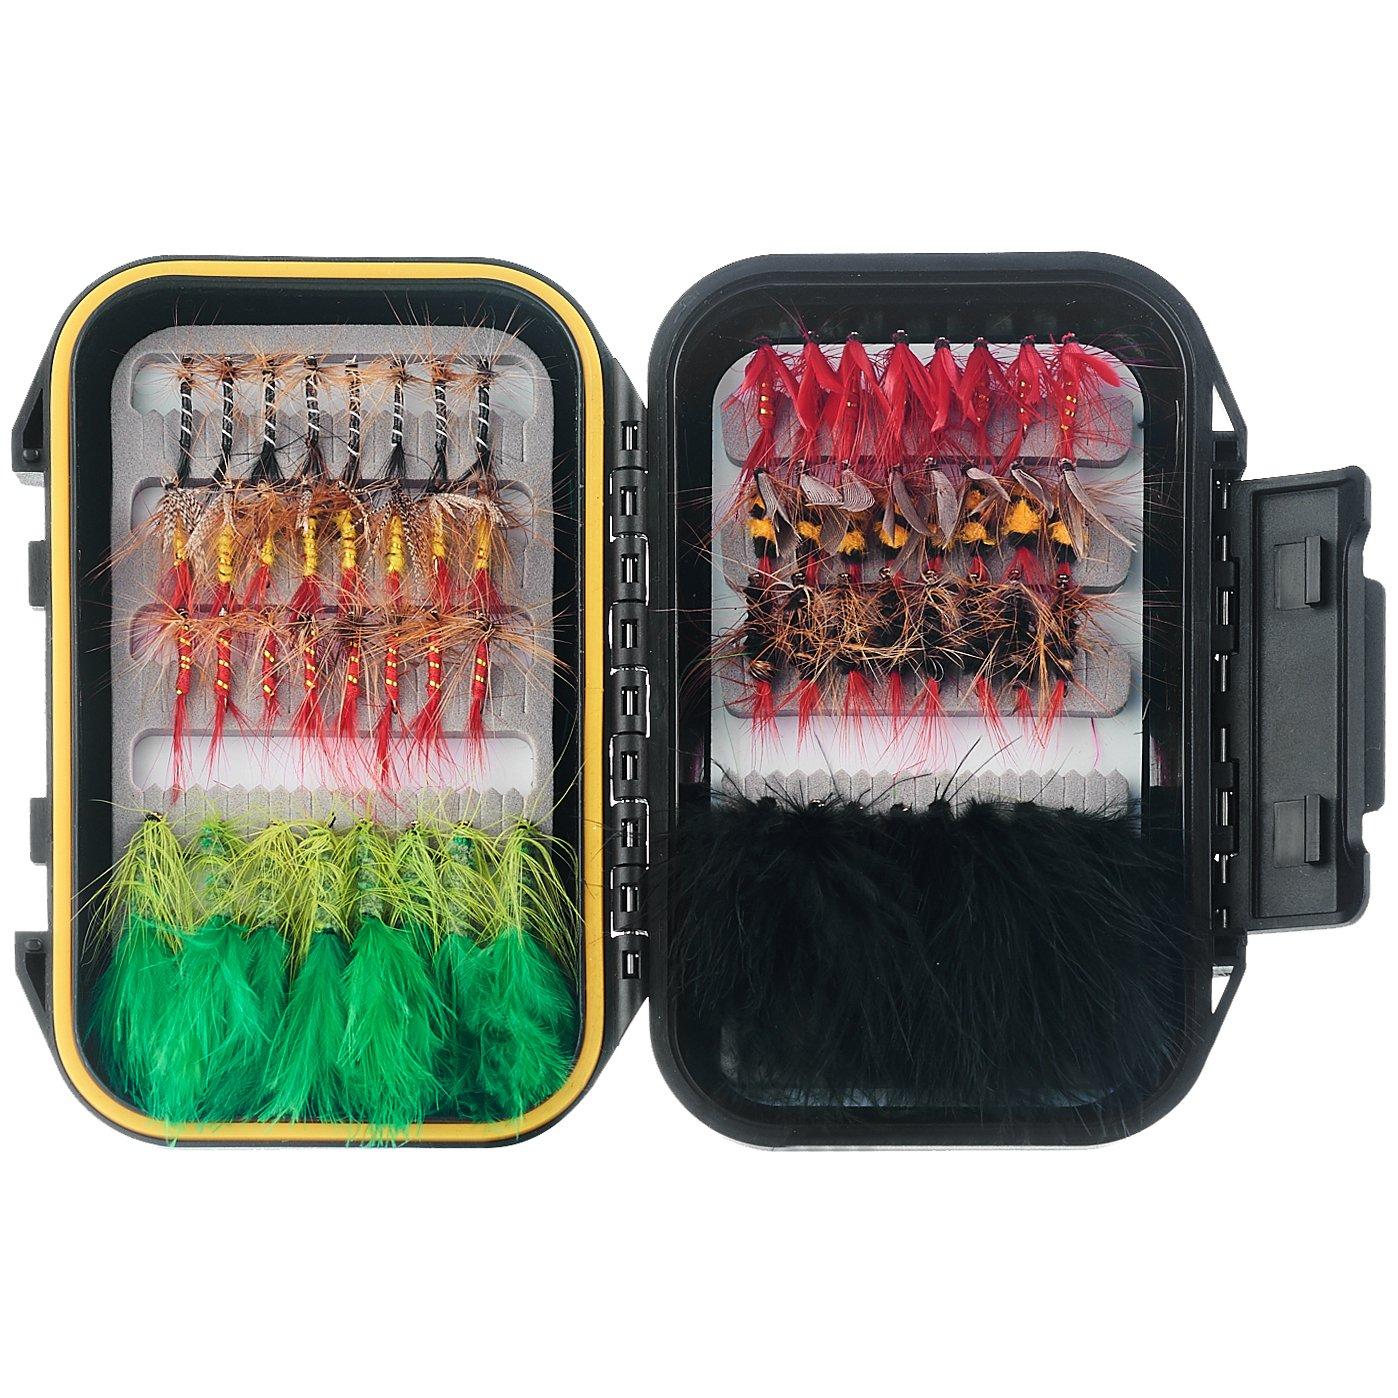 FISHINGSIR 64 PCS Fly Fishing Flies Set Included Dry Flies,Wet Flies,Streamer, Nymph, Emerger Kit with Waterproof Fly Box by FISHINGSIR